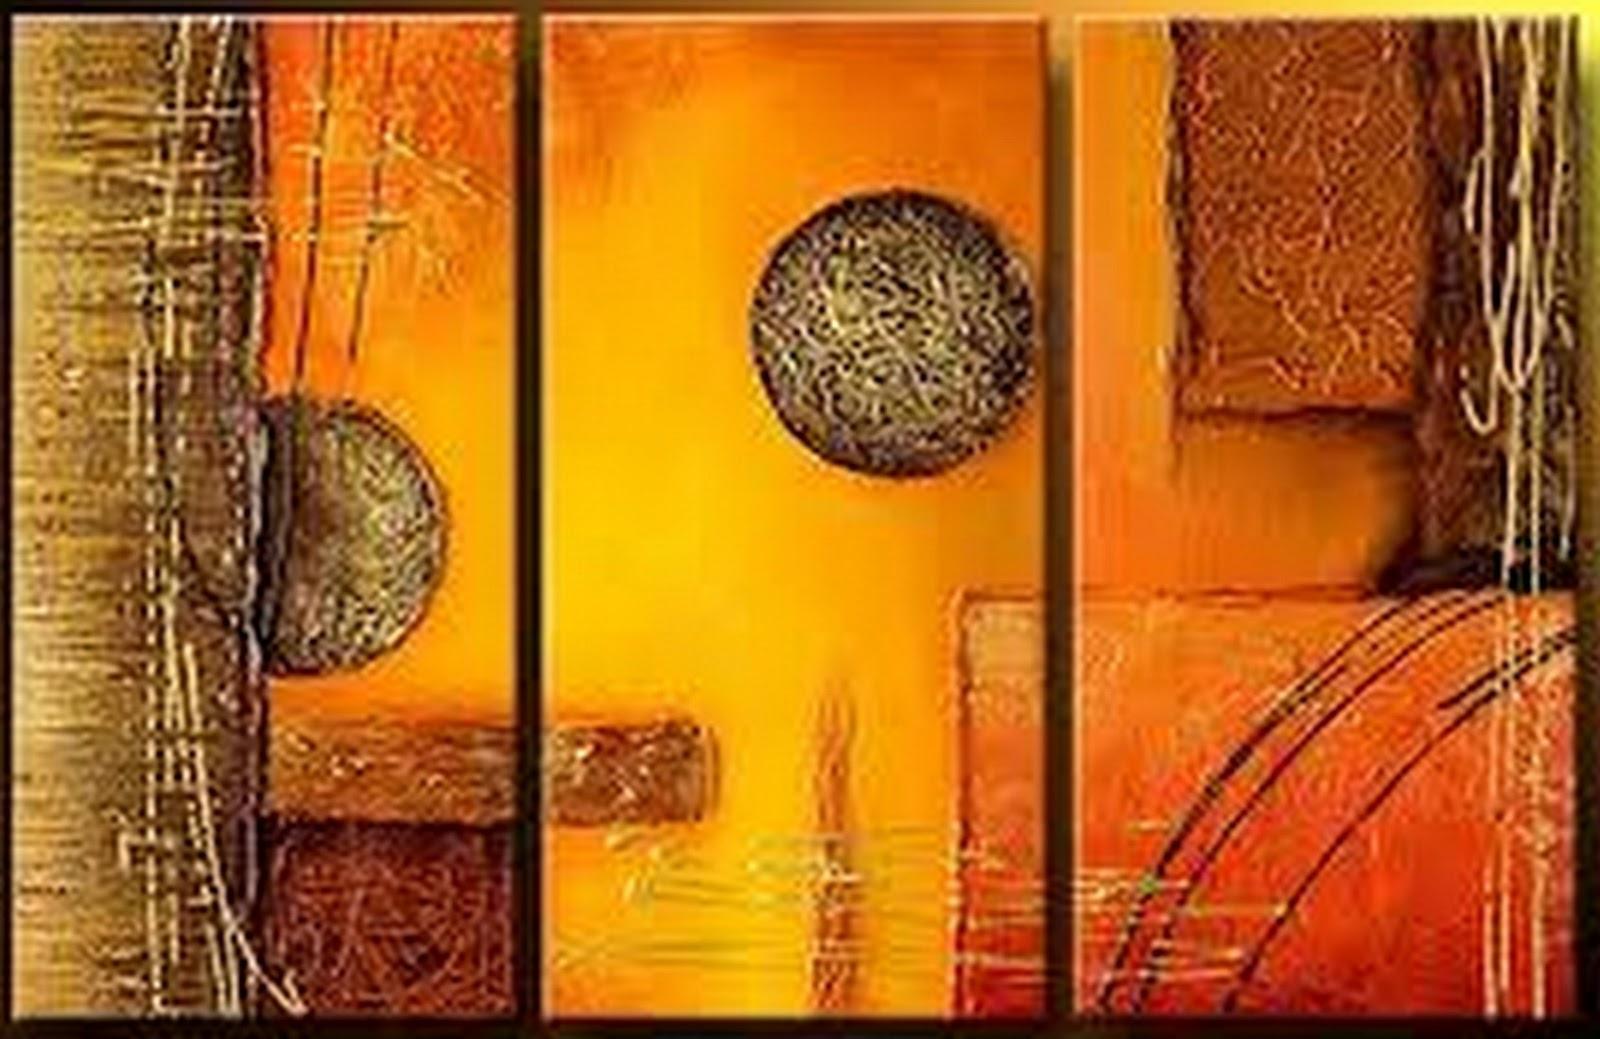 pintura moderna y fotograf a art stica fotos de cuadros On laminas de cuadros modernos